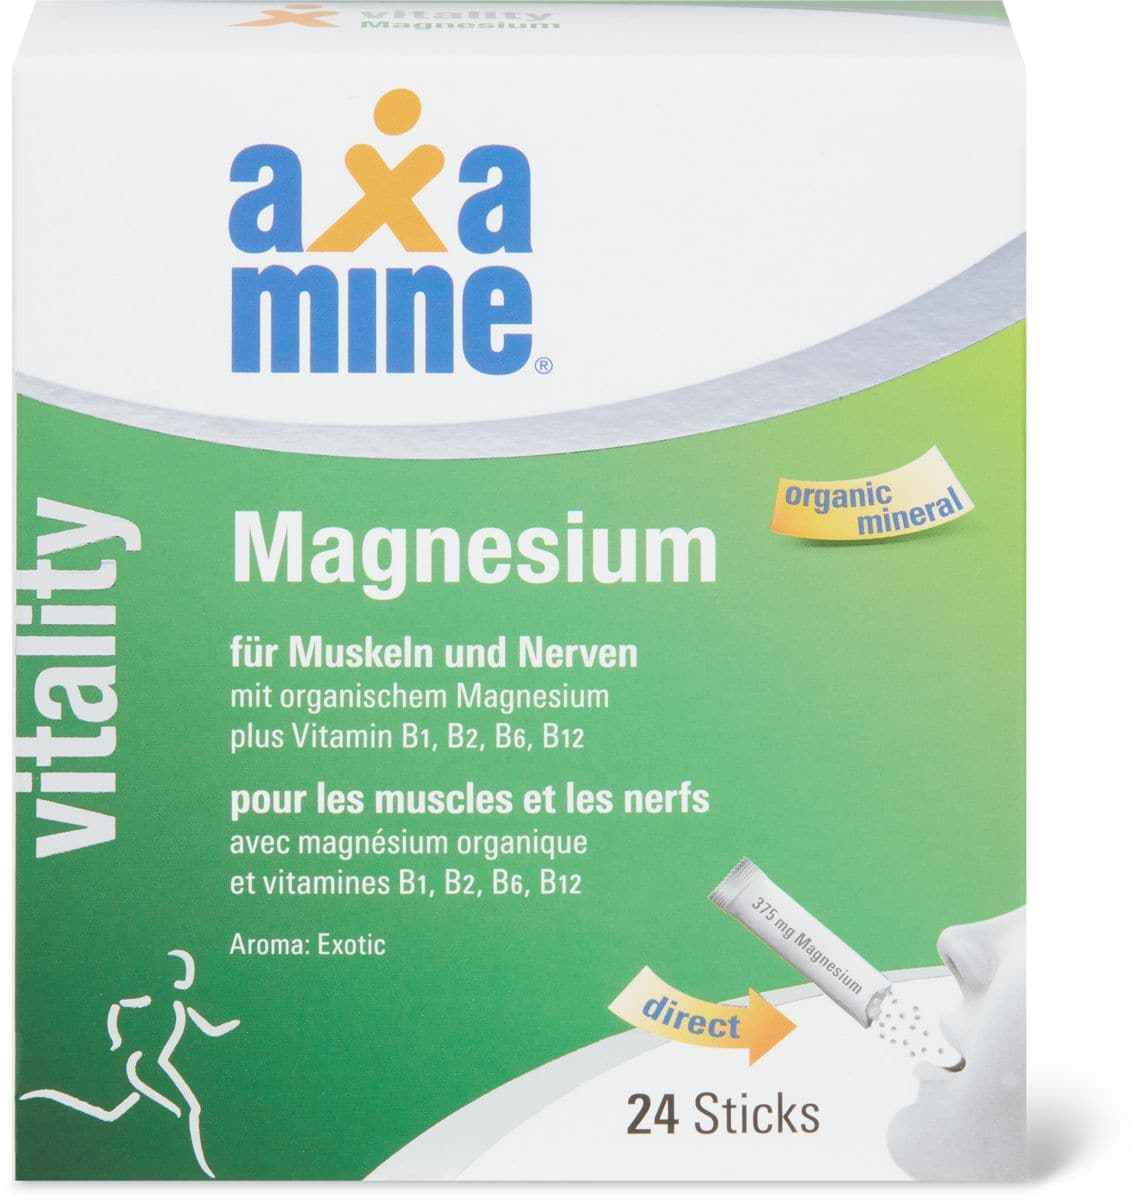 Axamine magnésium